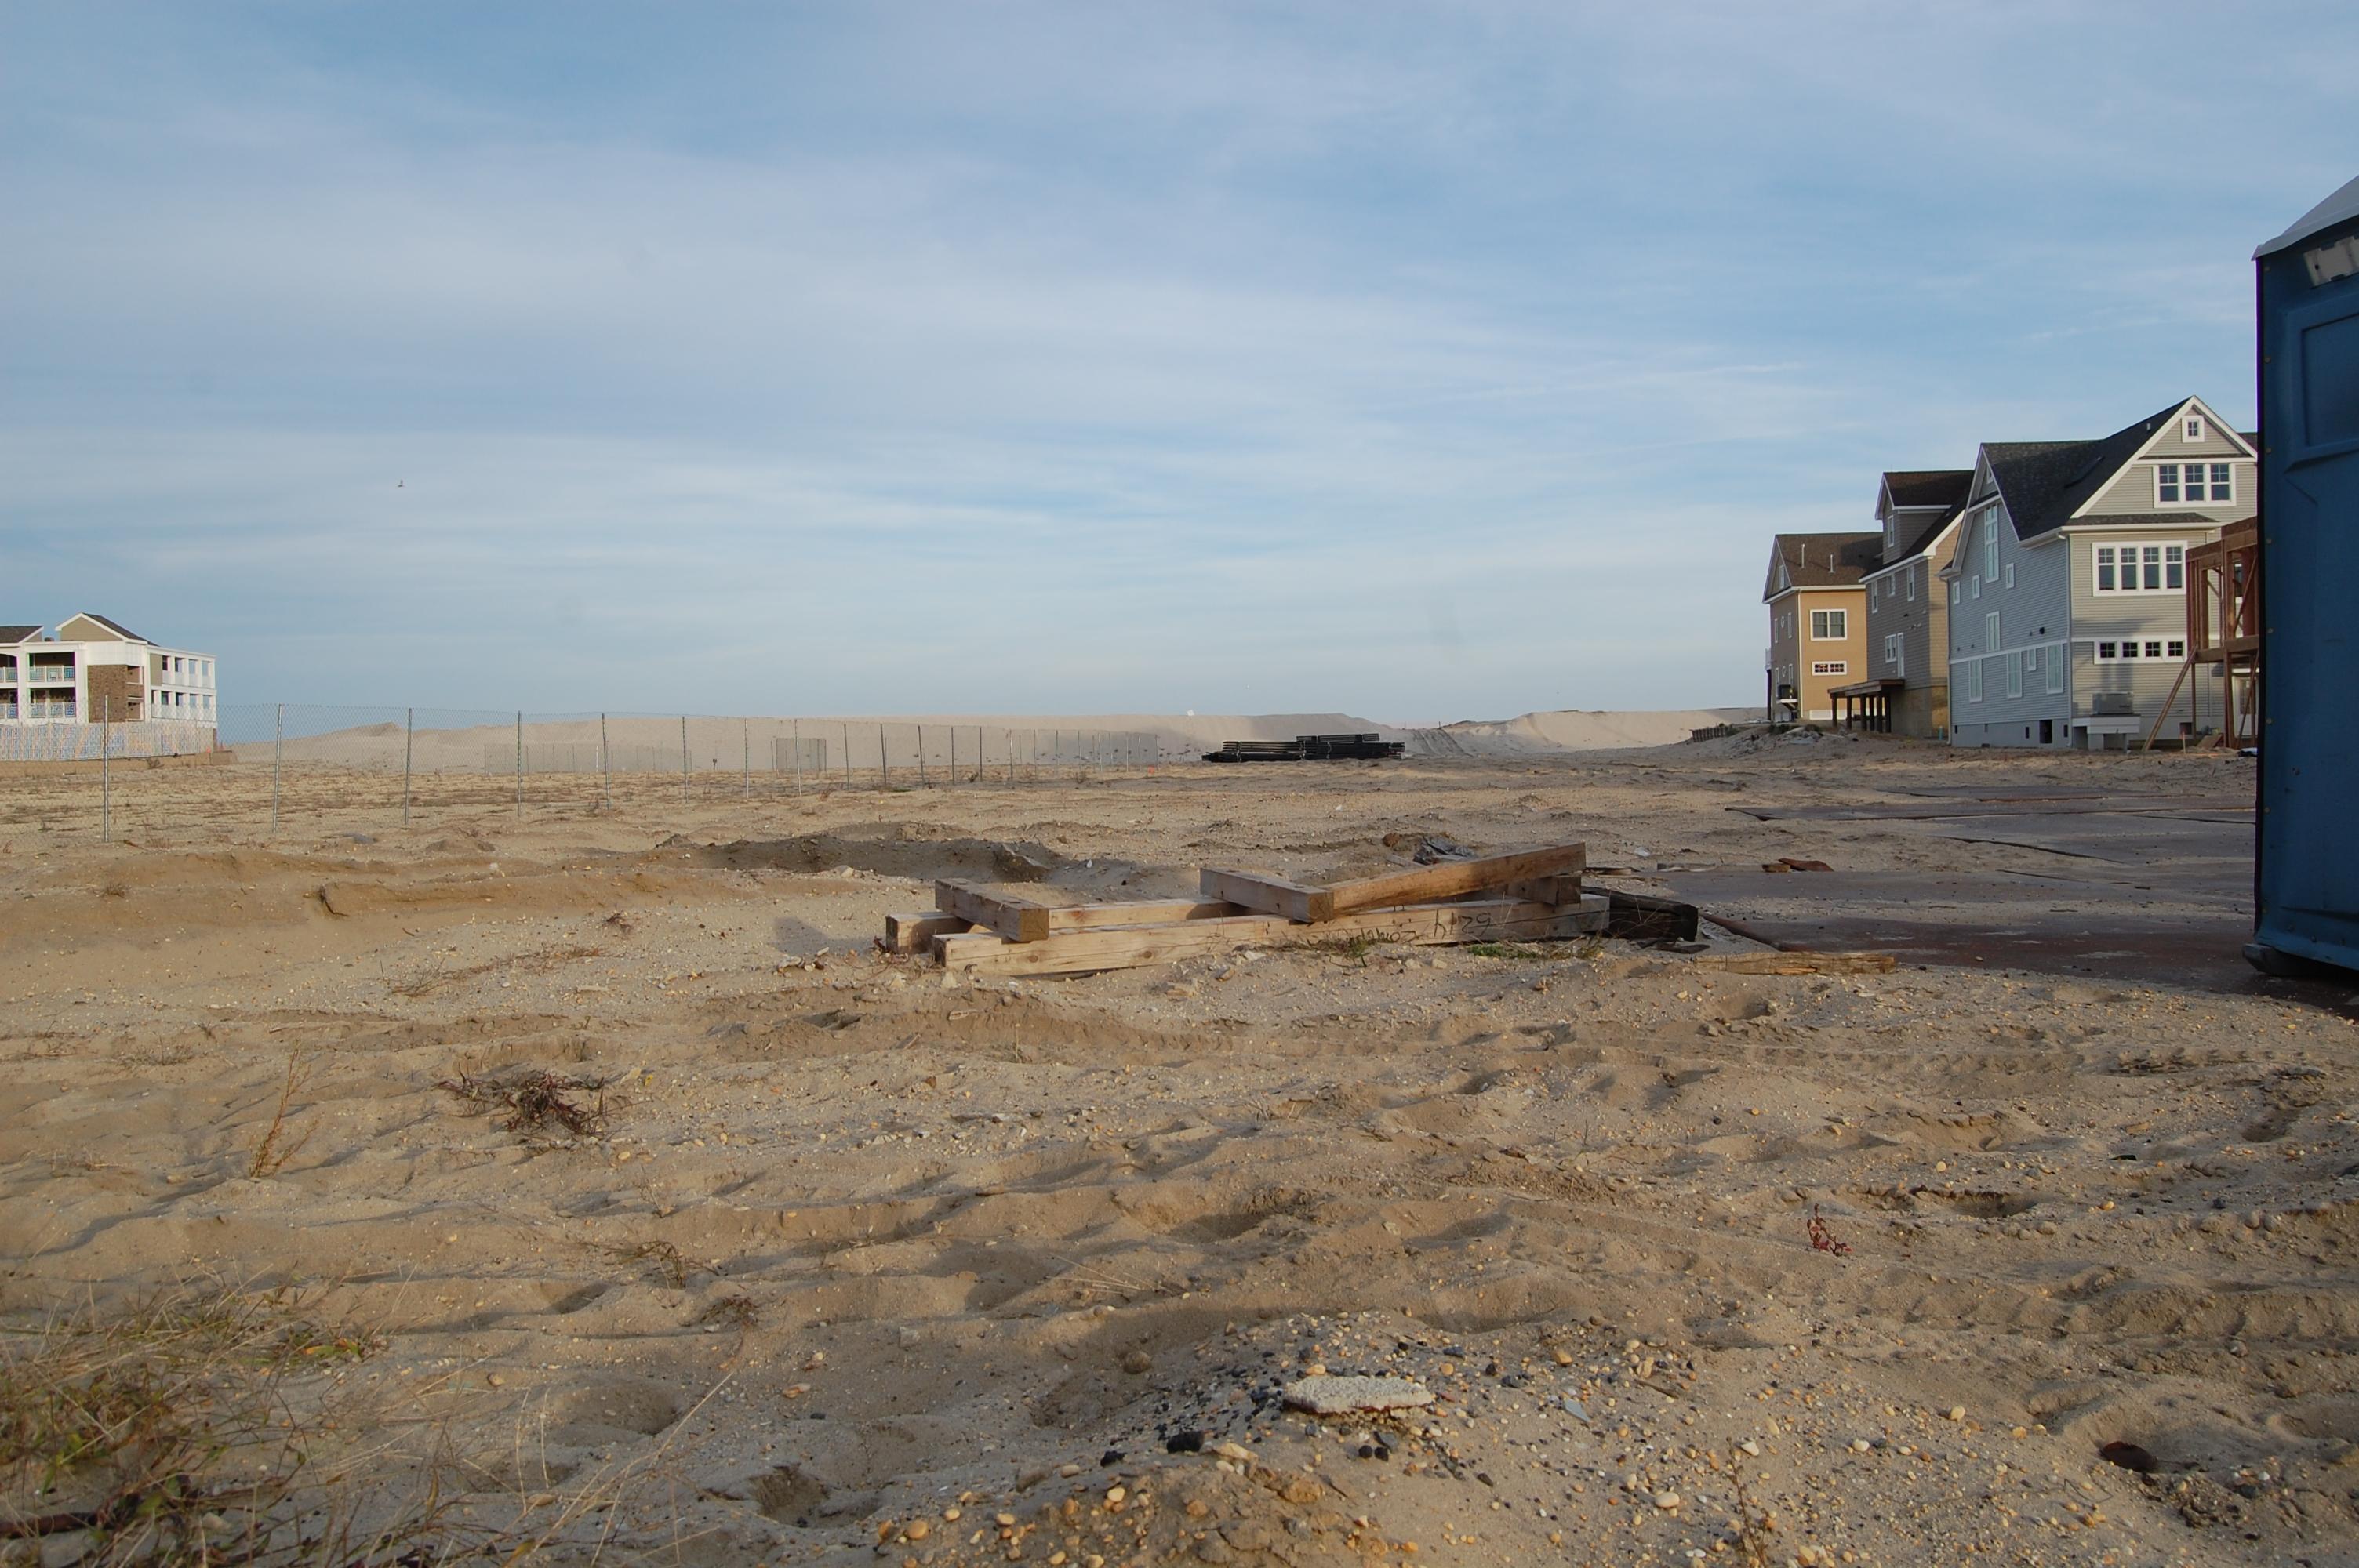 A desolate landscape at Camp Osborn, Oct. 28, 2014 (Photo: Daniel Nee)